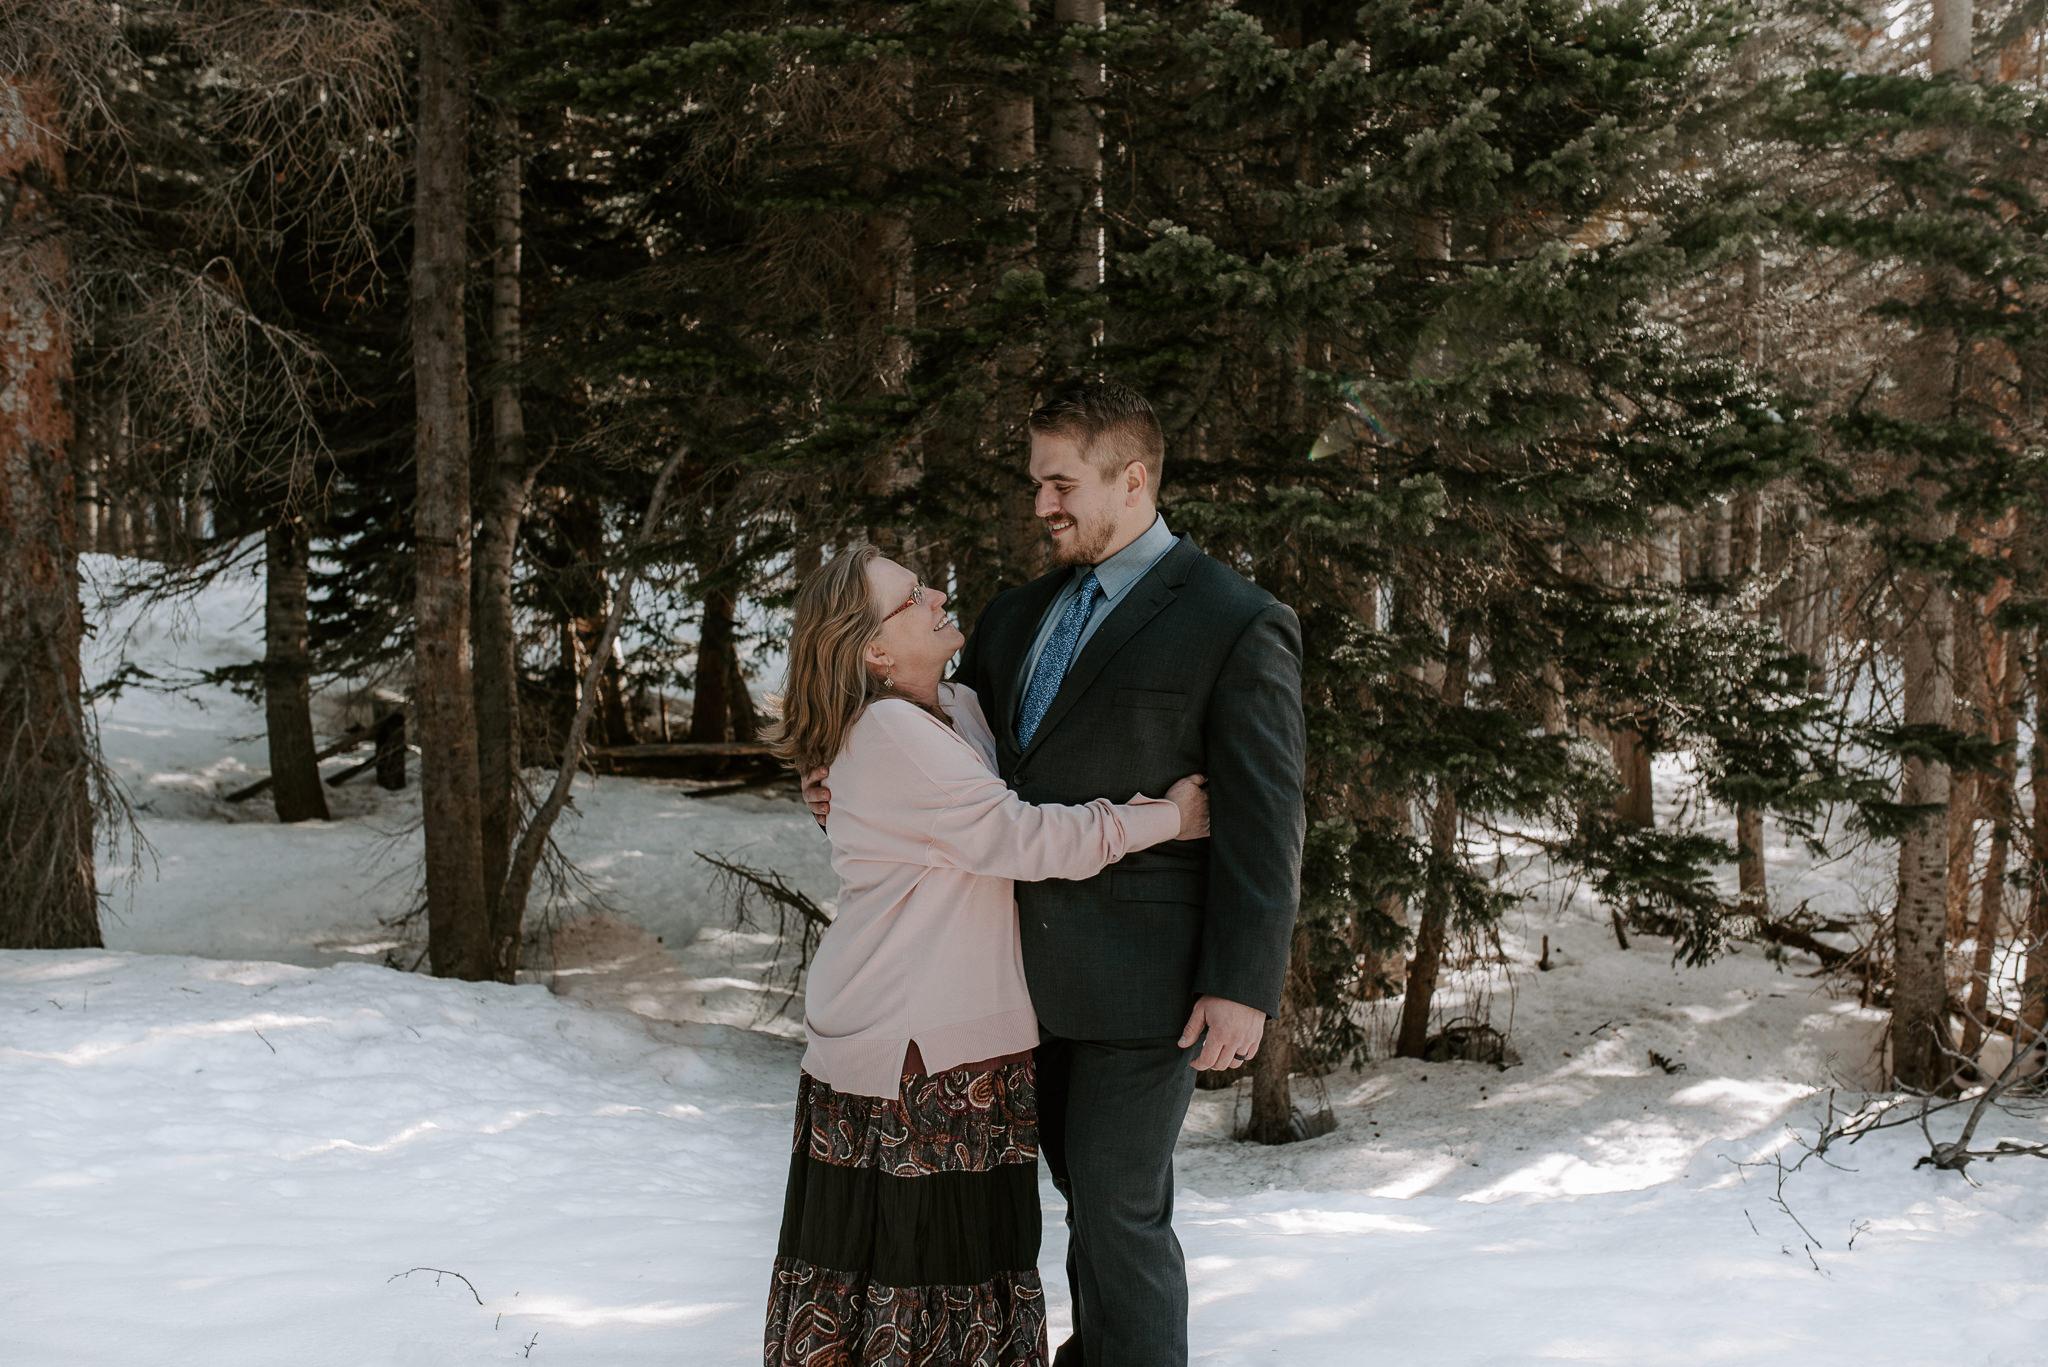 Colorado based adventure wedding photographer